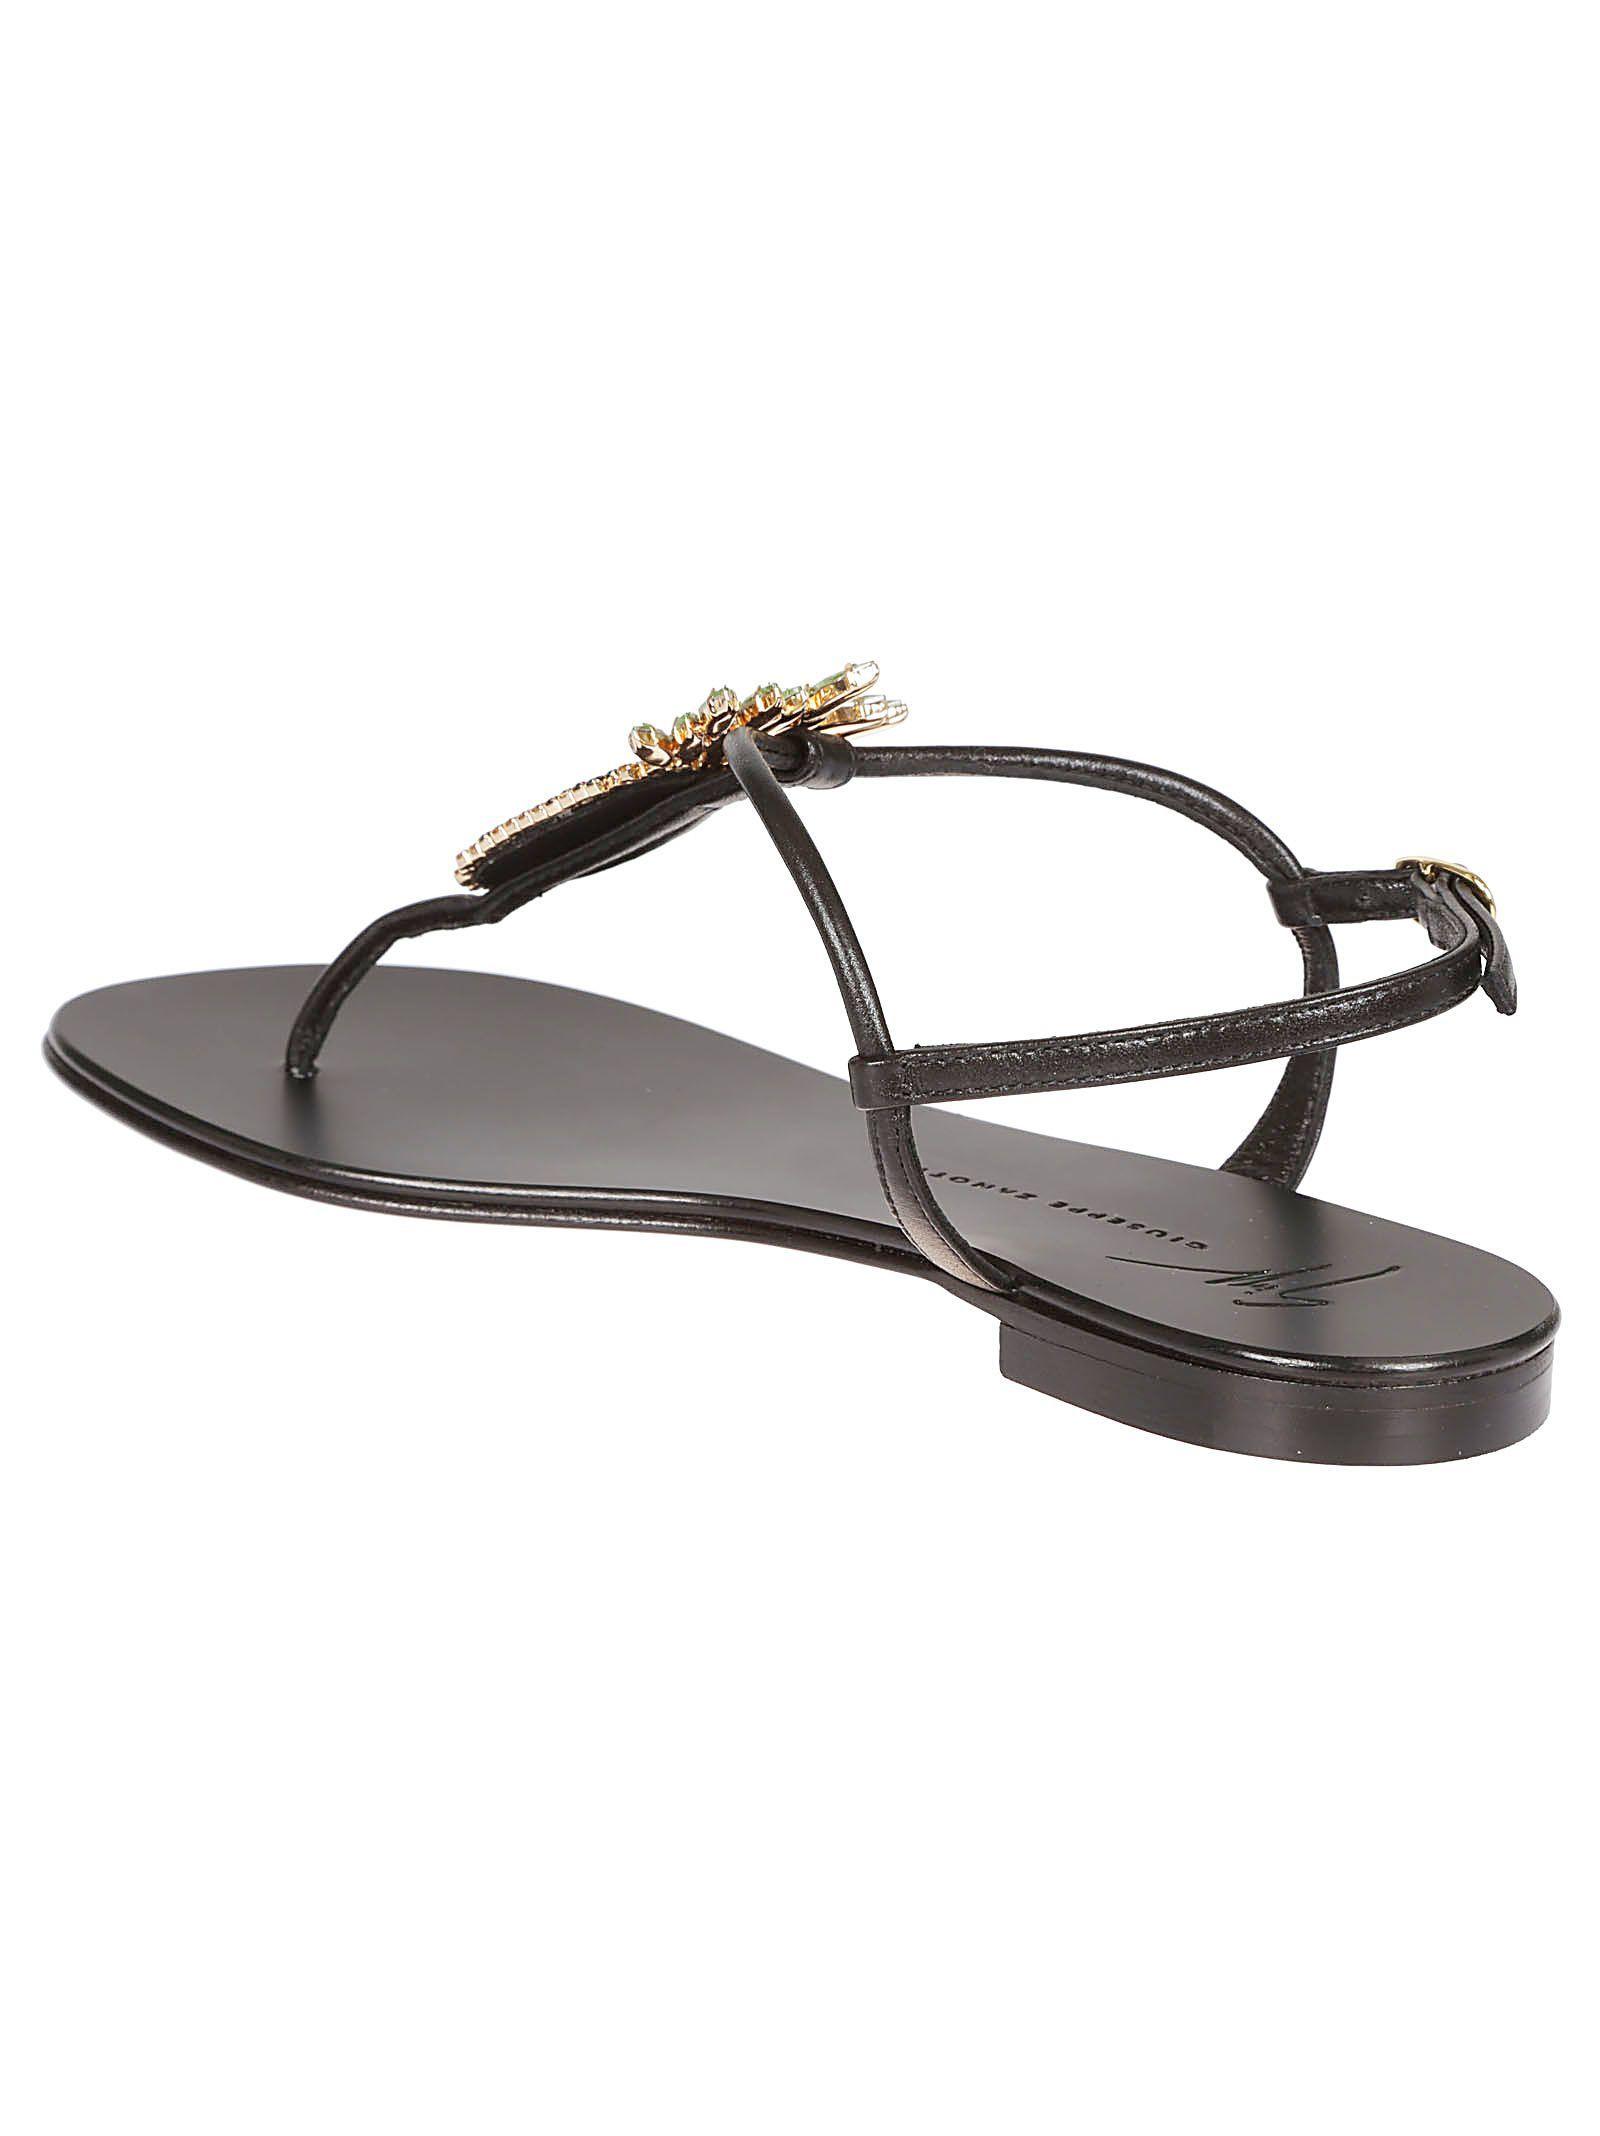 8cf5744e5b08a GIUSEPPE ZANOTTI | Giuseppe Zanotti Giuseppe Zanotti Giuseppe Zanotti  Embellished Pineapple Flat Sandals #Shoes #Sandals #GIUSEPPE ZANOTTI